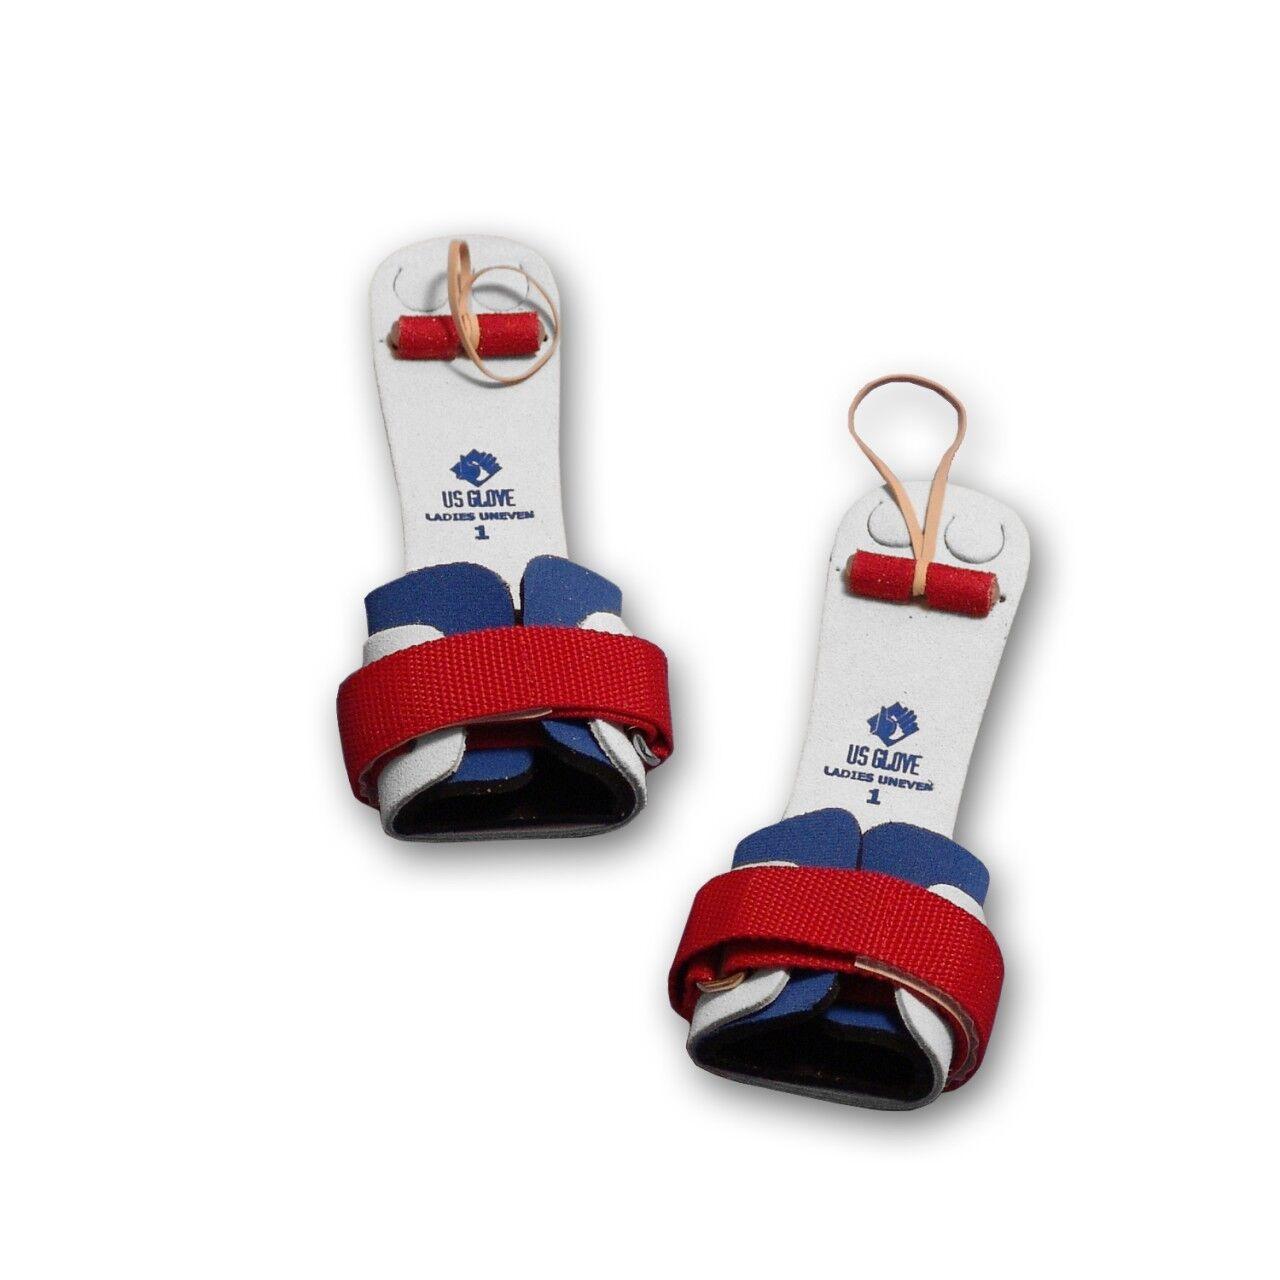 Milenium Two Gymnastics Grips Size 2 Free Shipping